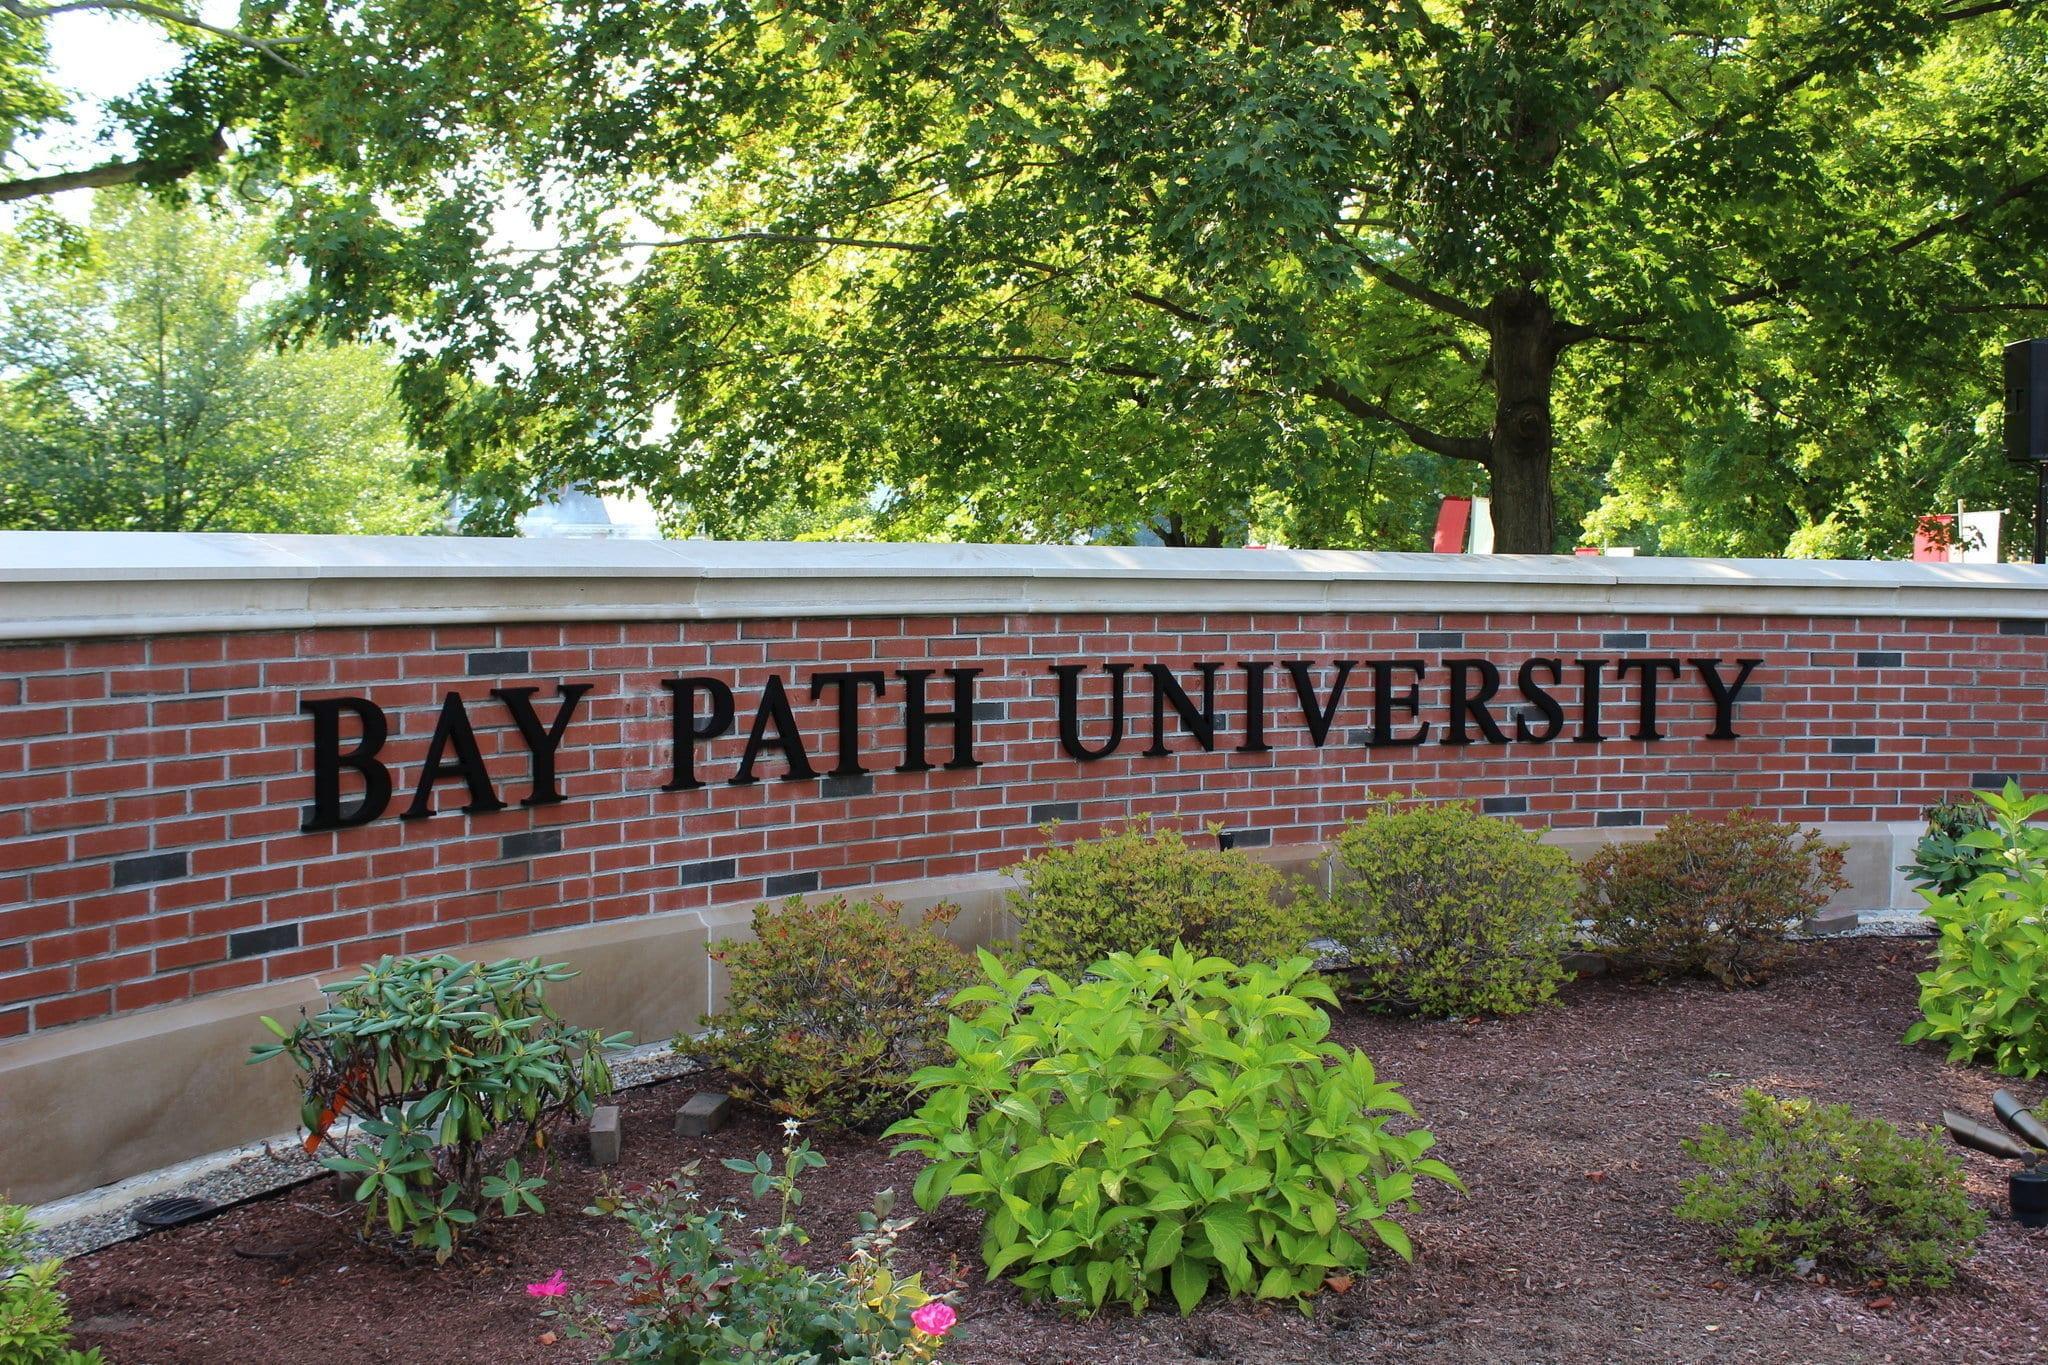 baypath university